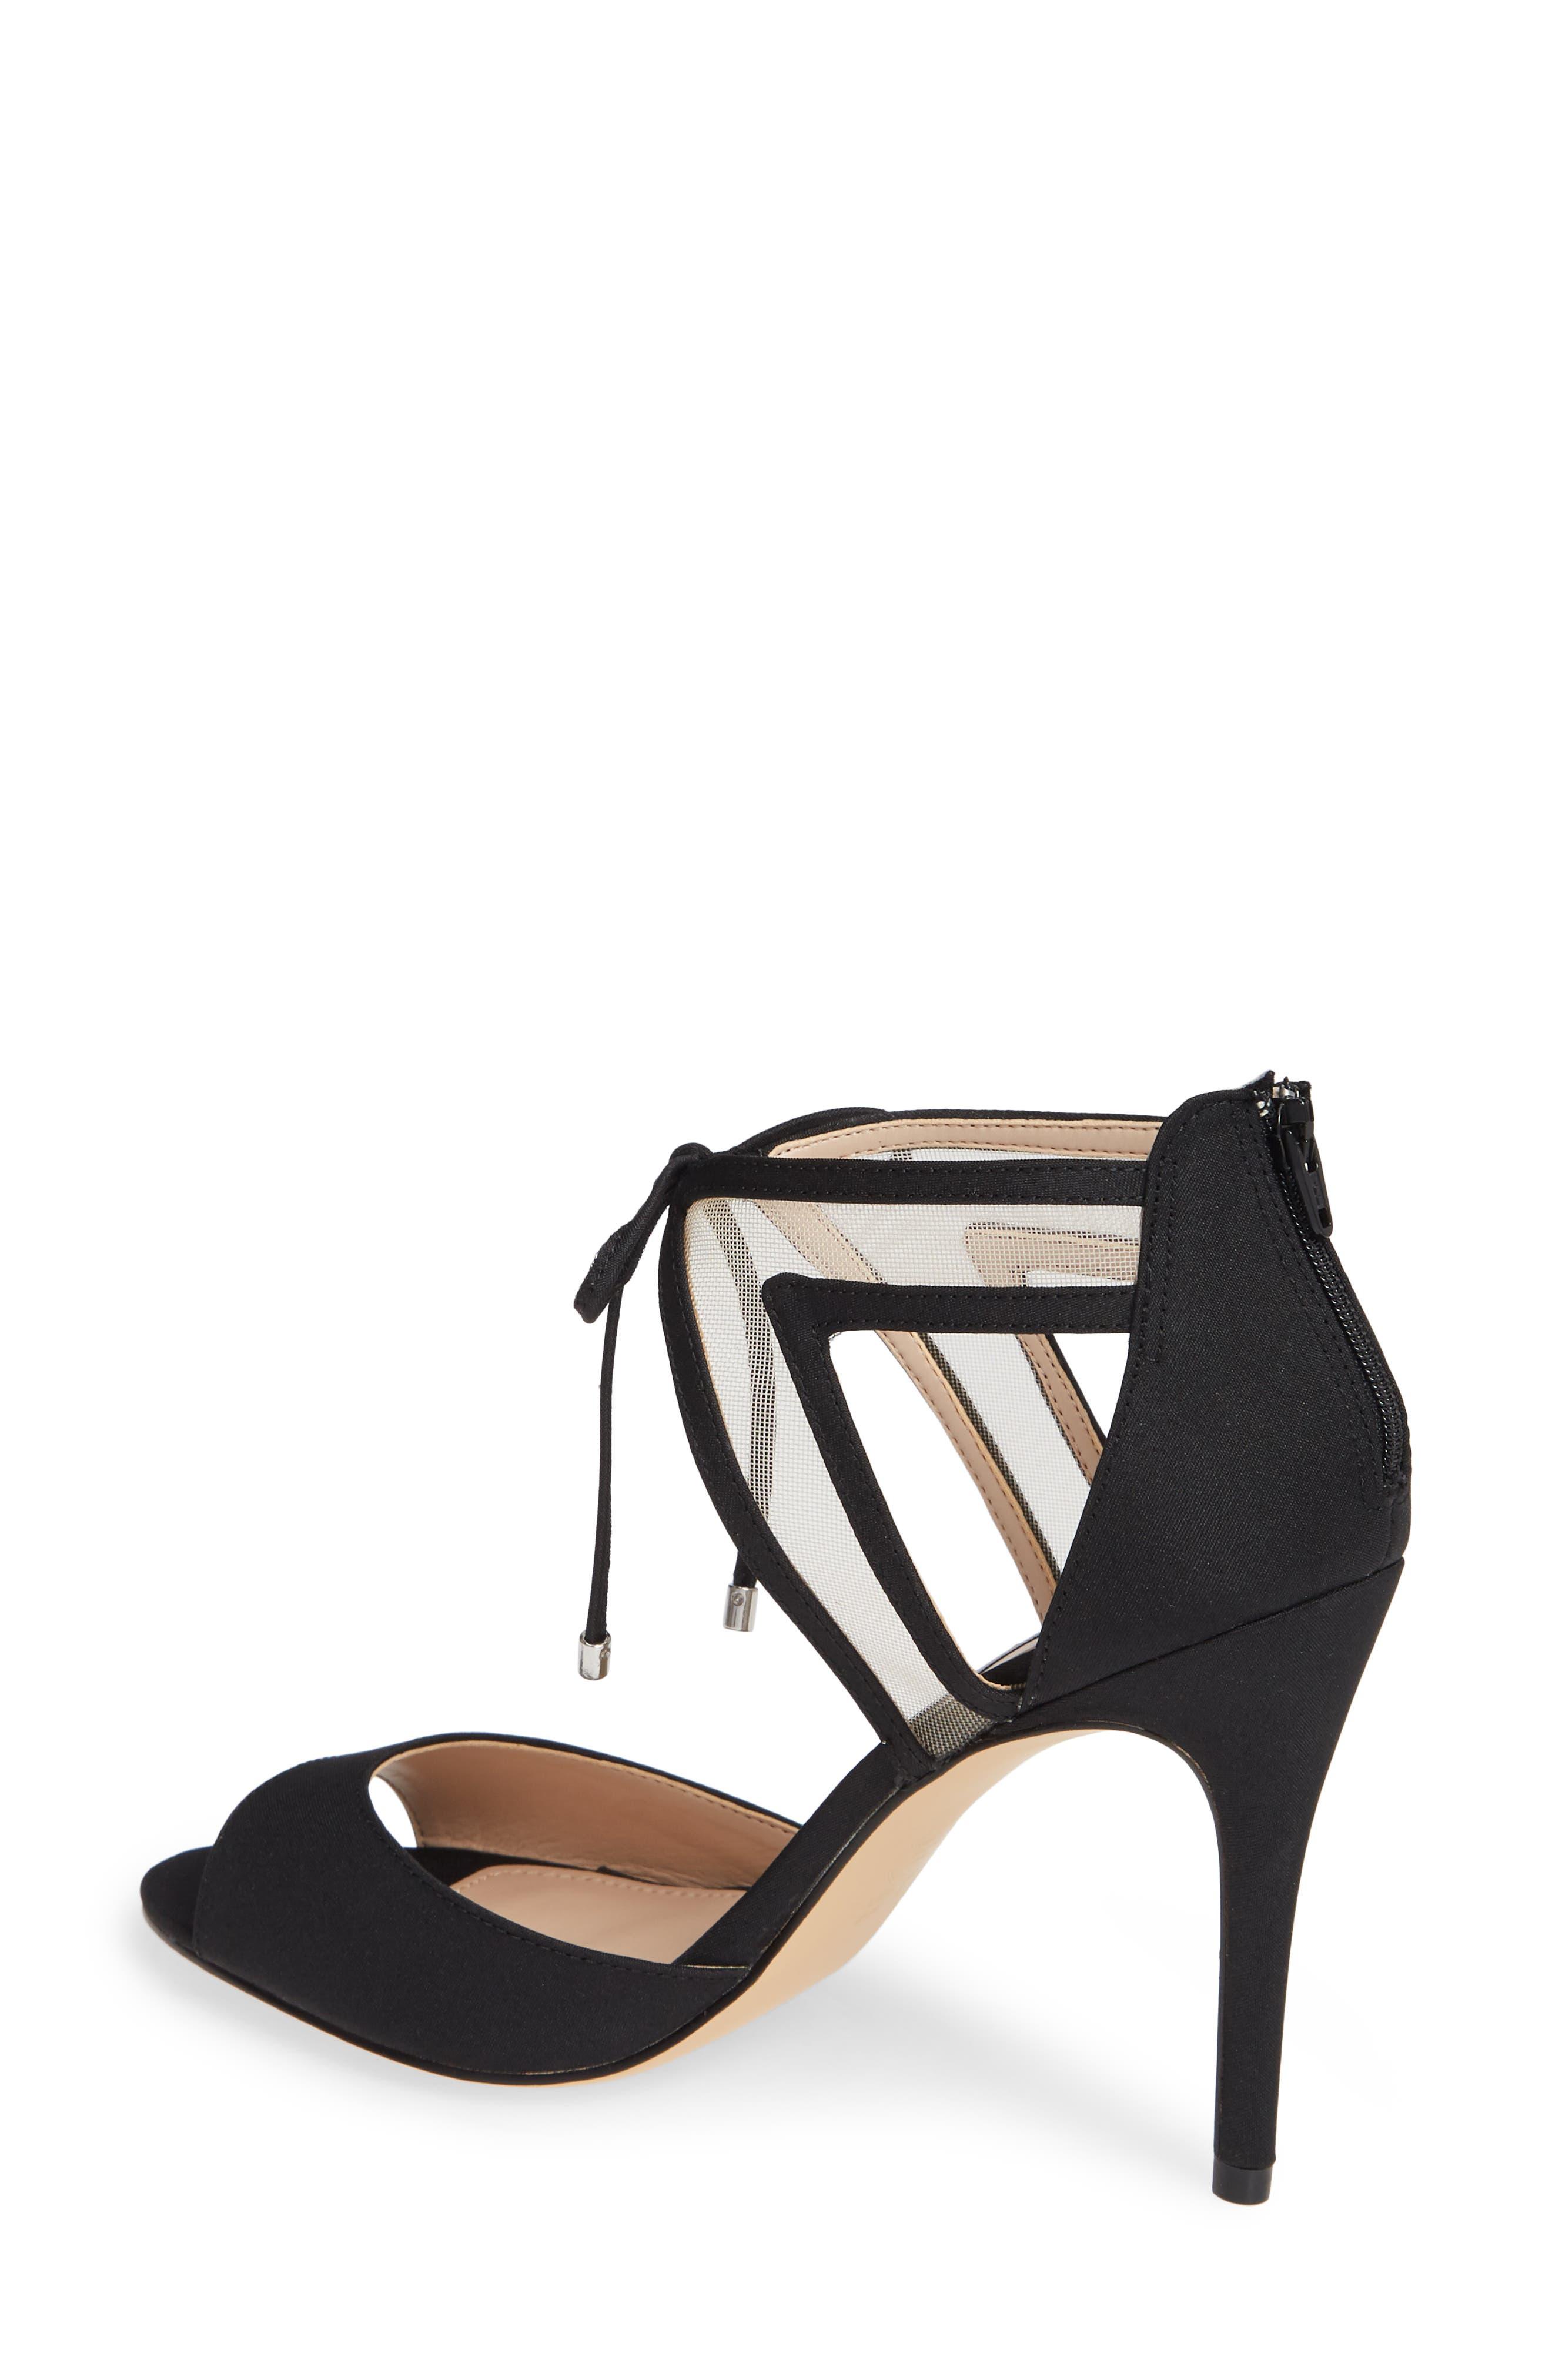 Caleya Ankle Tie Sandal,                             Alternate thumbnail 2, color,                             BLACK CHAMPAGNE